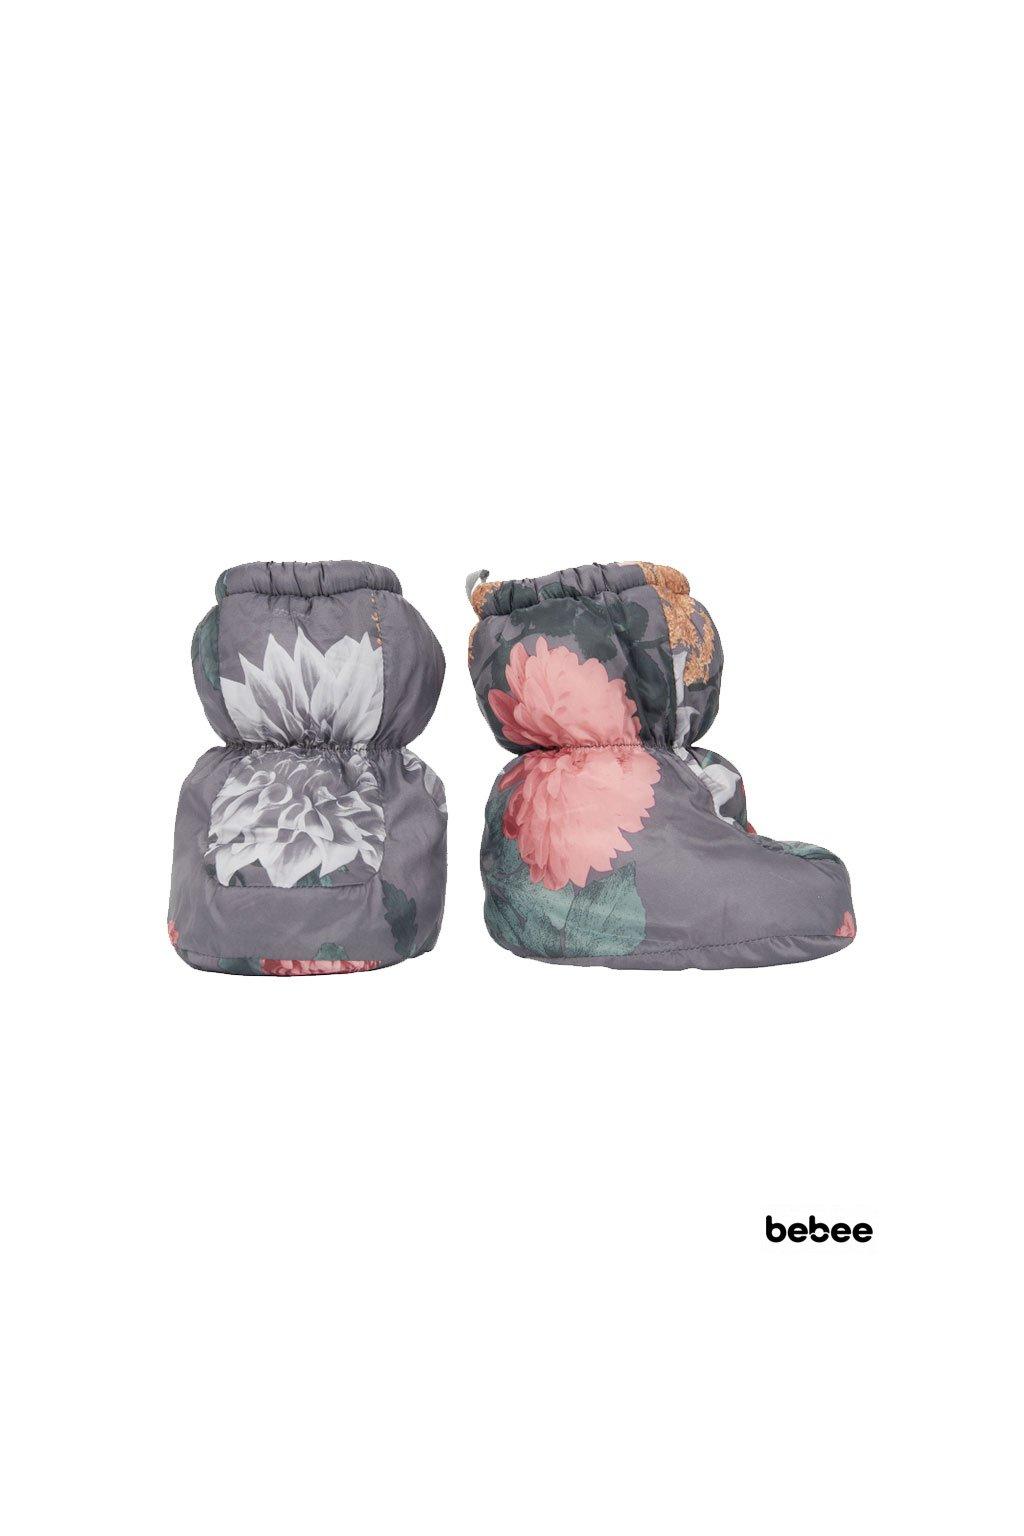 zimne capacky socker polyester print peony lodger 1